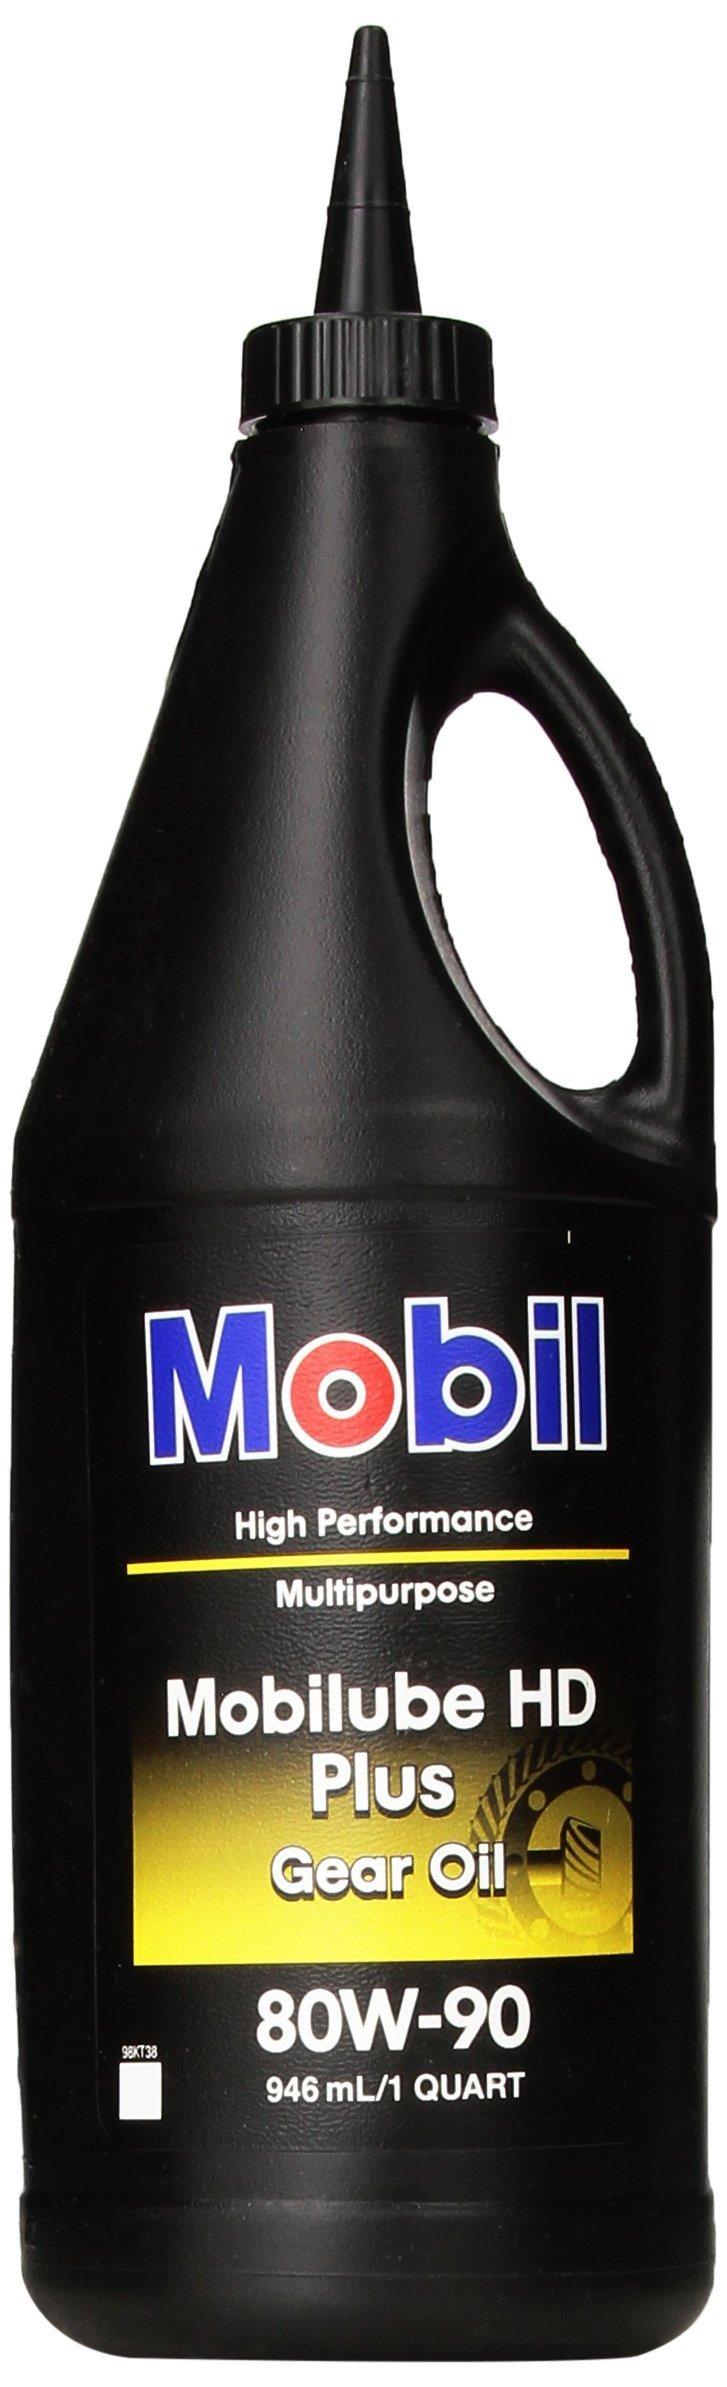 Mobilube HD Plus 80w90, Gear Oil, 1 qt